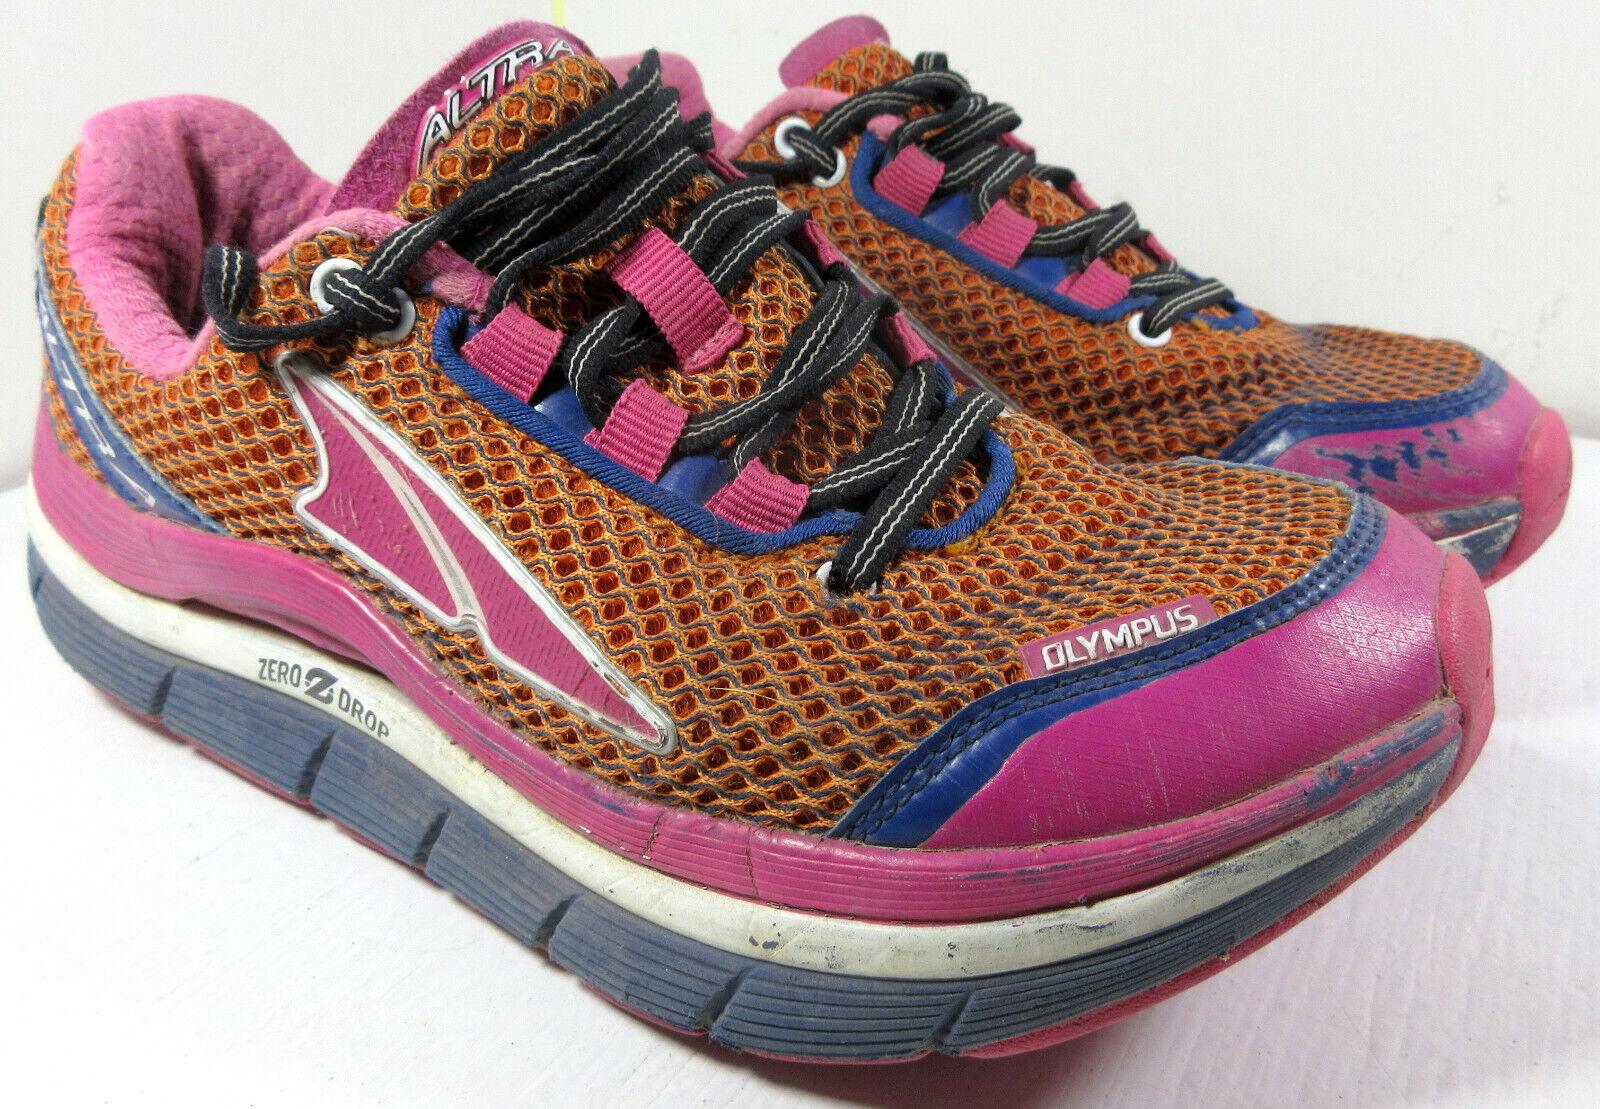 Altra Olympus Zero Drop Trail Running shoes Pink orange A2355-1 Size 7 US Women